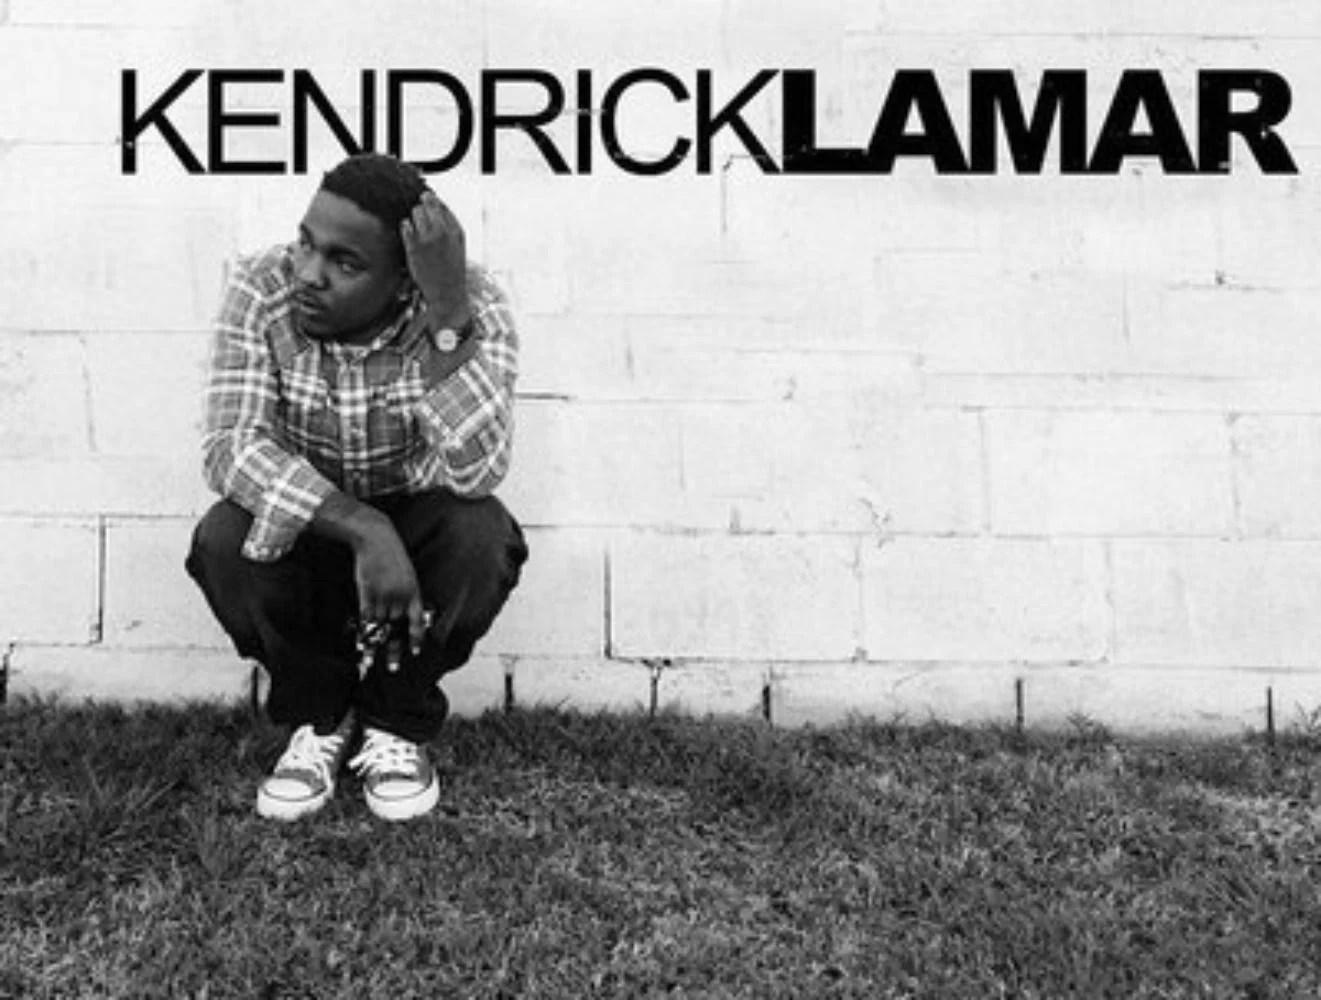 Merchandise 24 7 Kendrick Lamar Poster 36 X24 Poster